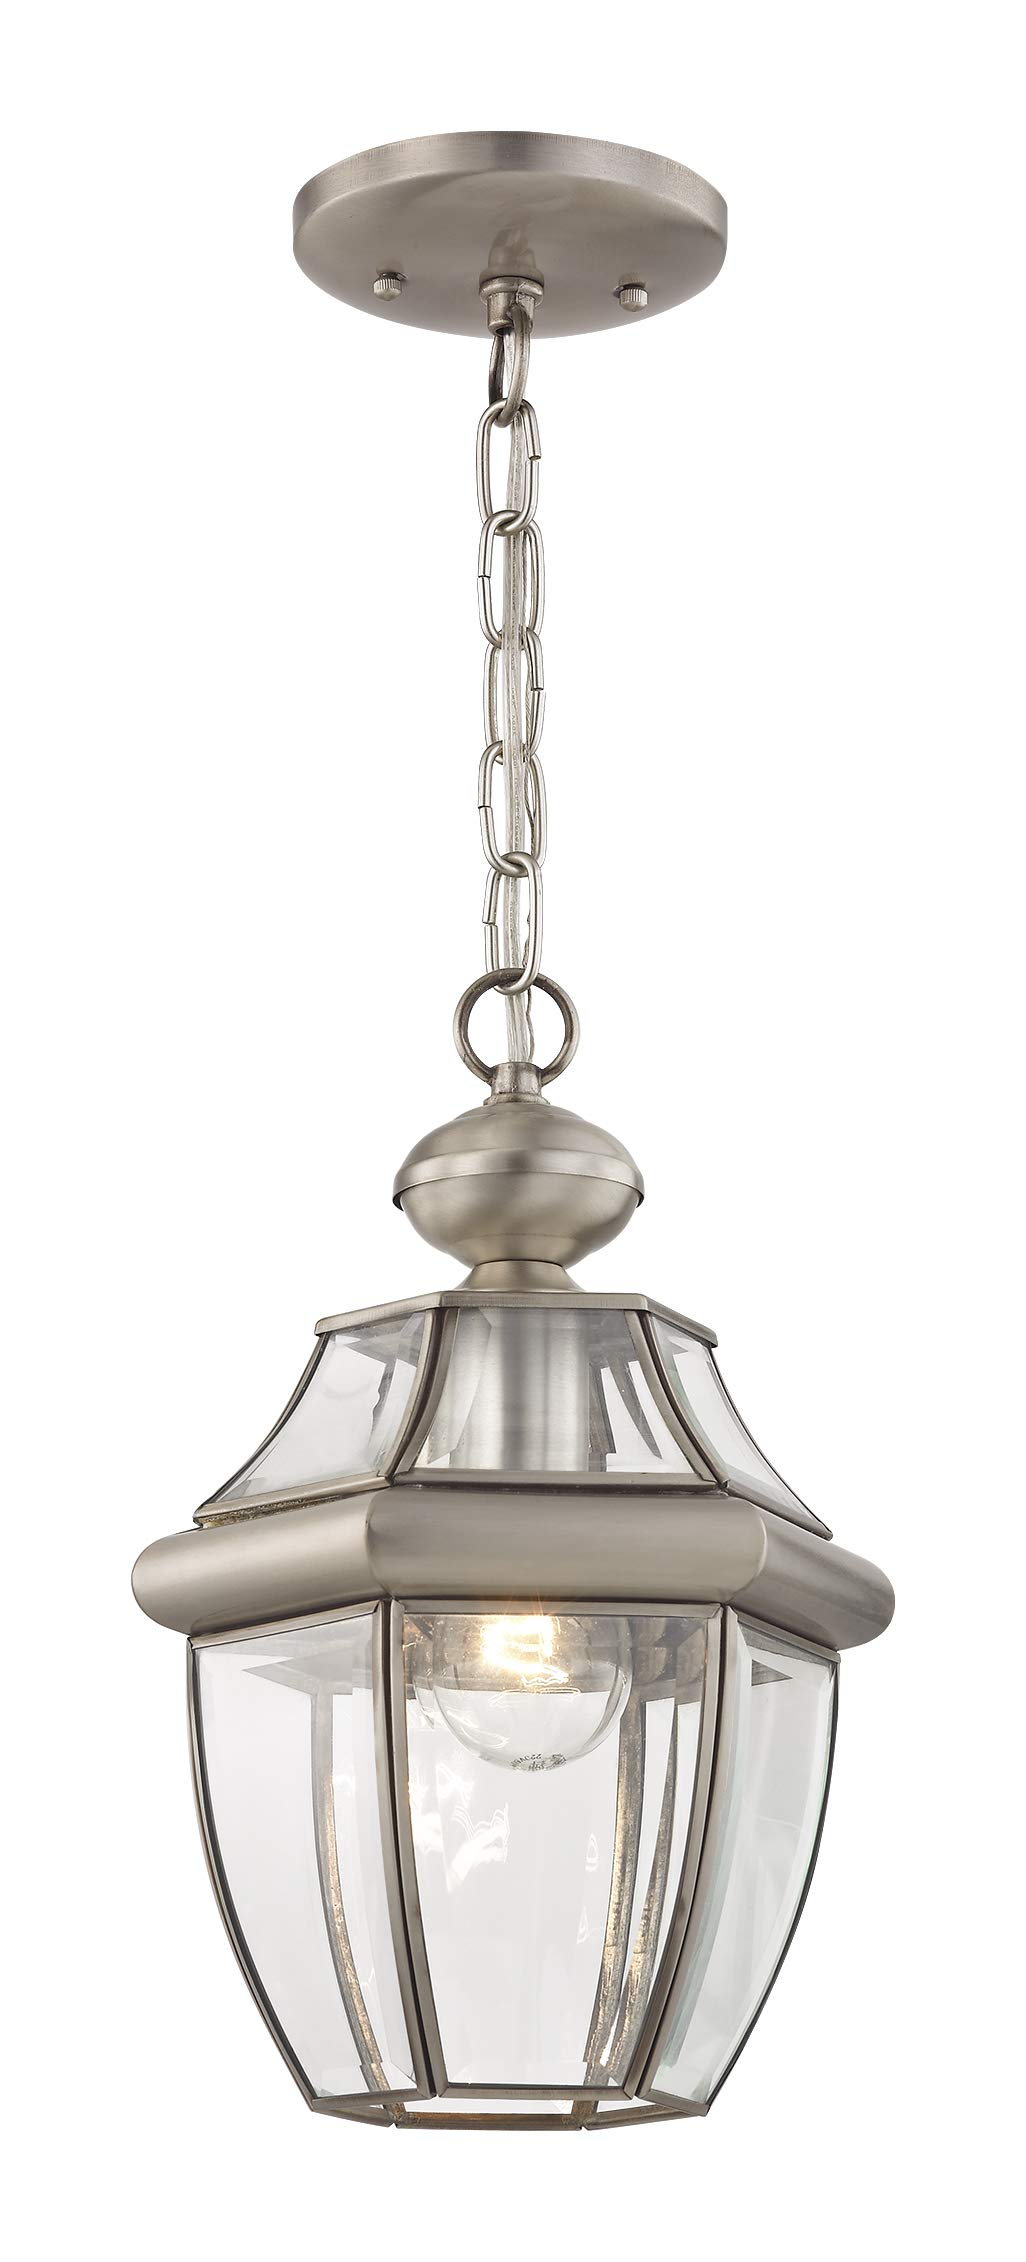 Livex Lighting 2152-91 Monterey 1-Light Outdoor Hanging Lantern, Brushed Nickel